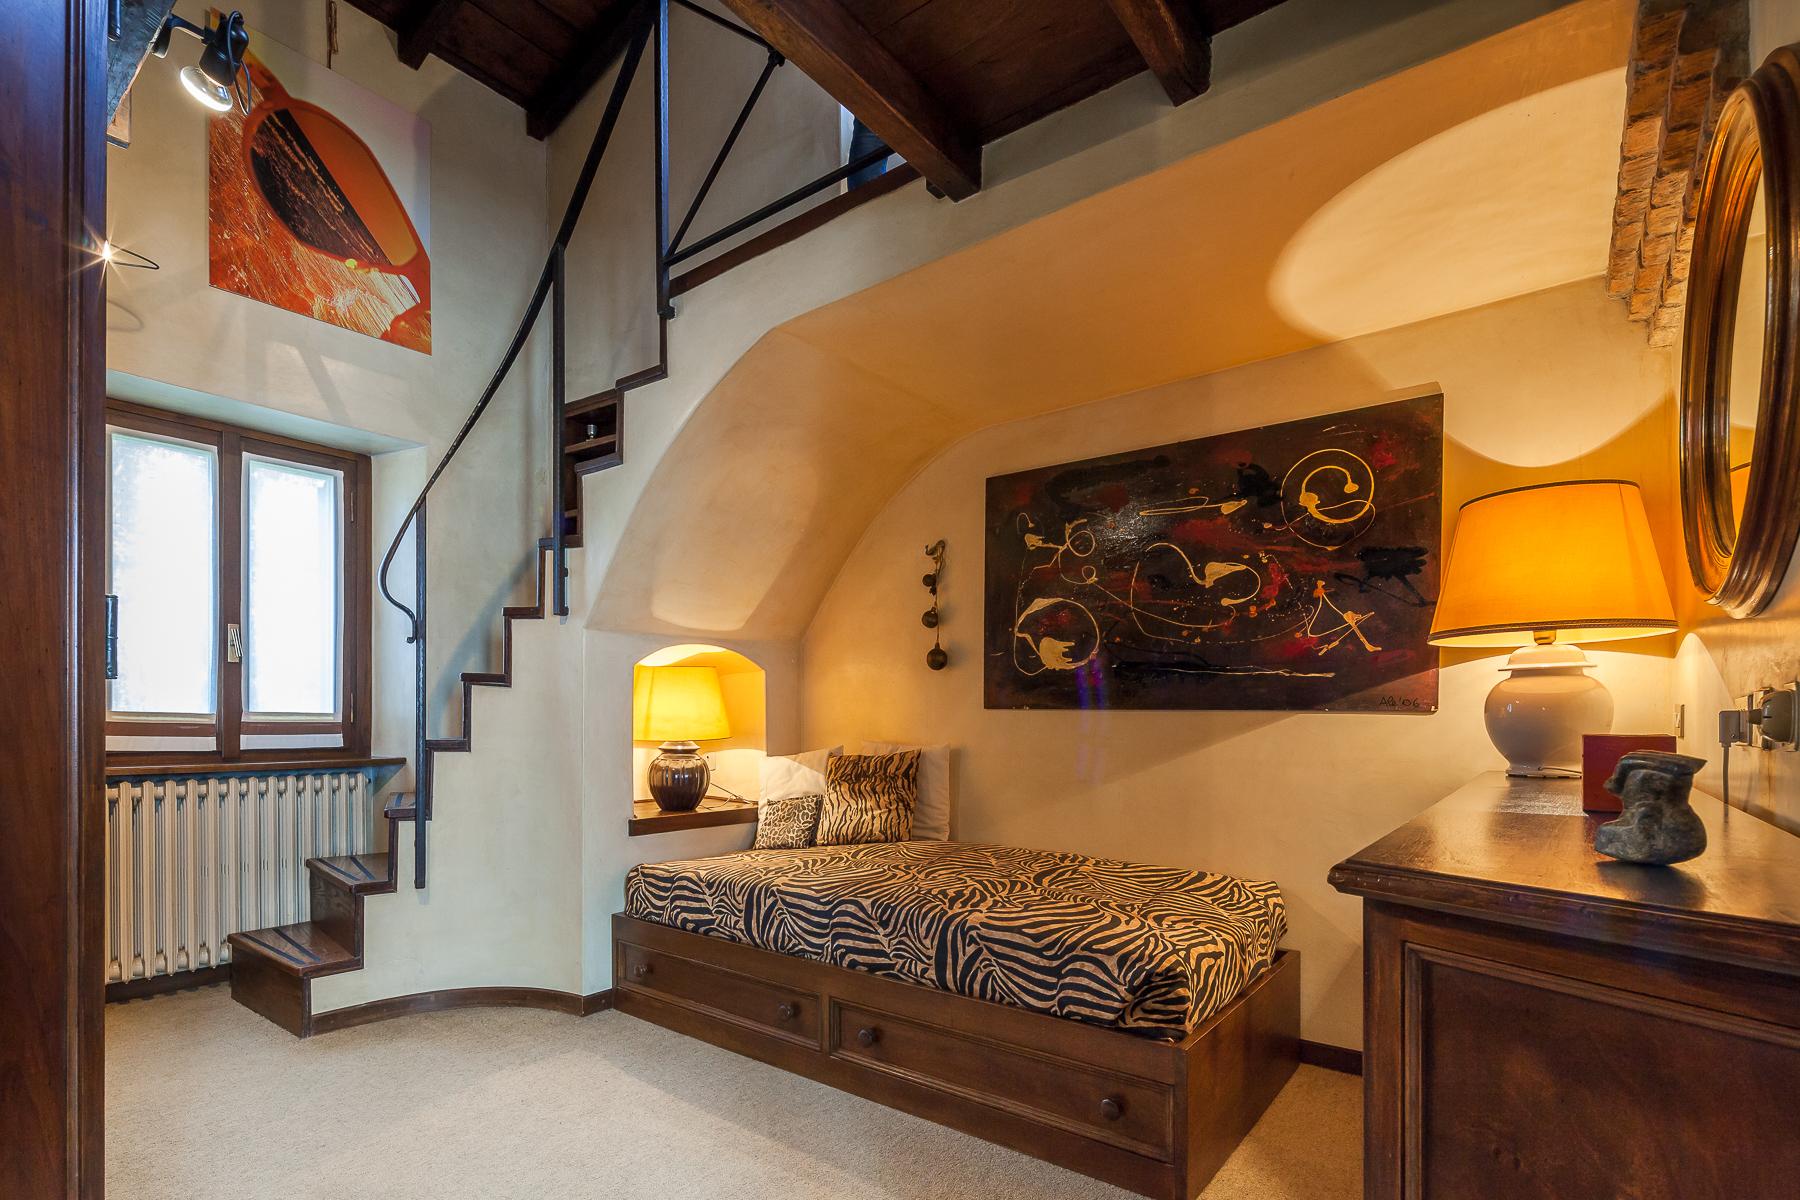 Villa in Vendita a Gorle: 5 locali, 850 mq - Foto 11